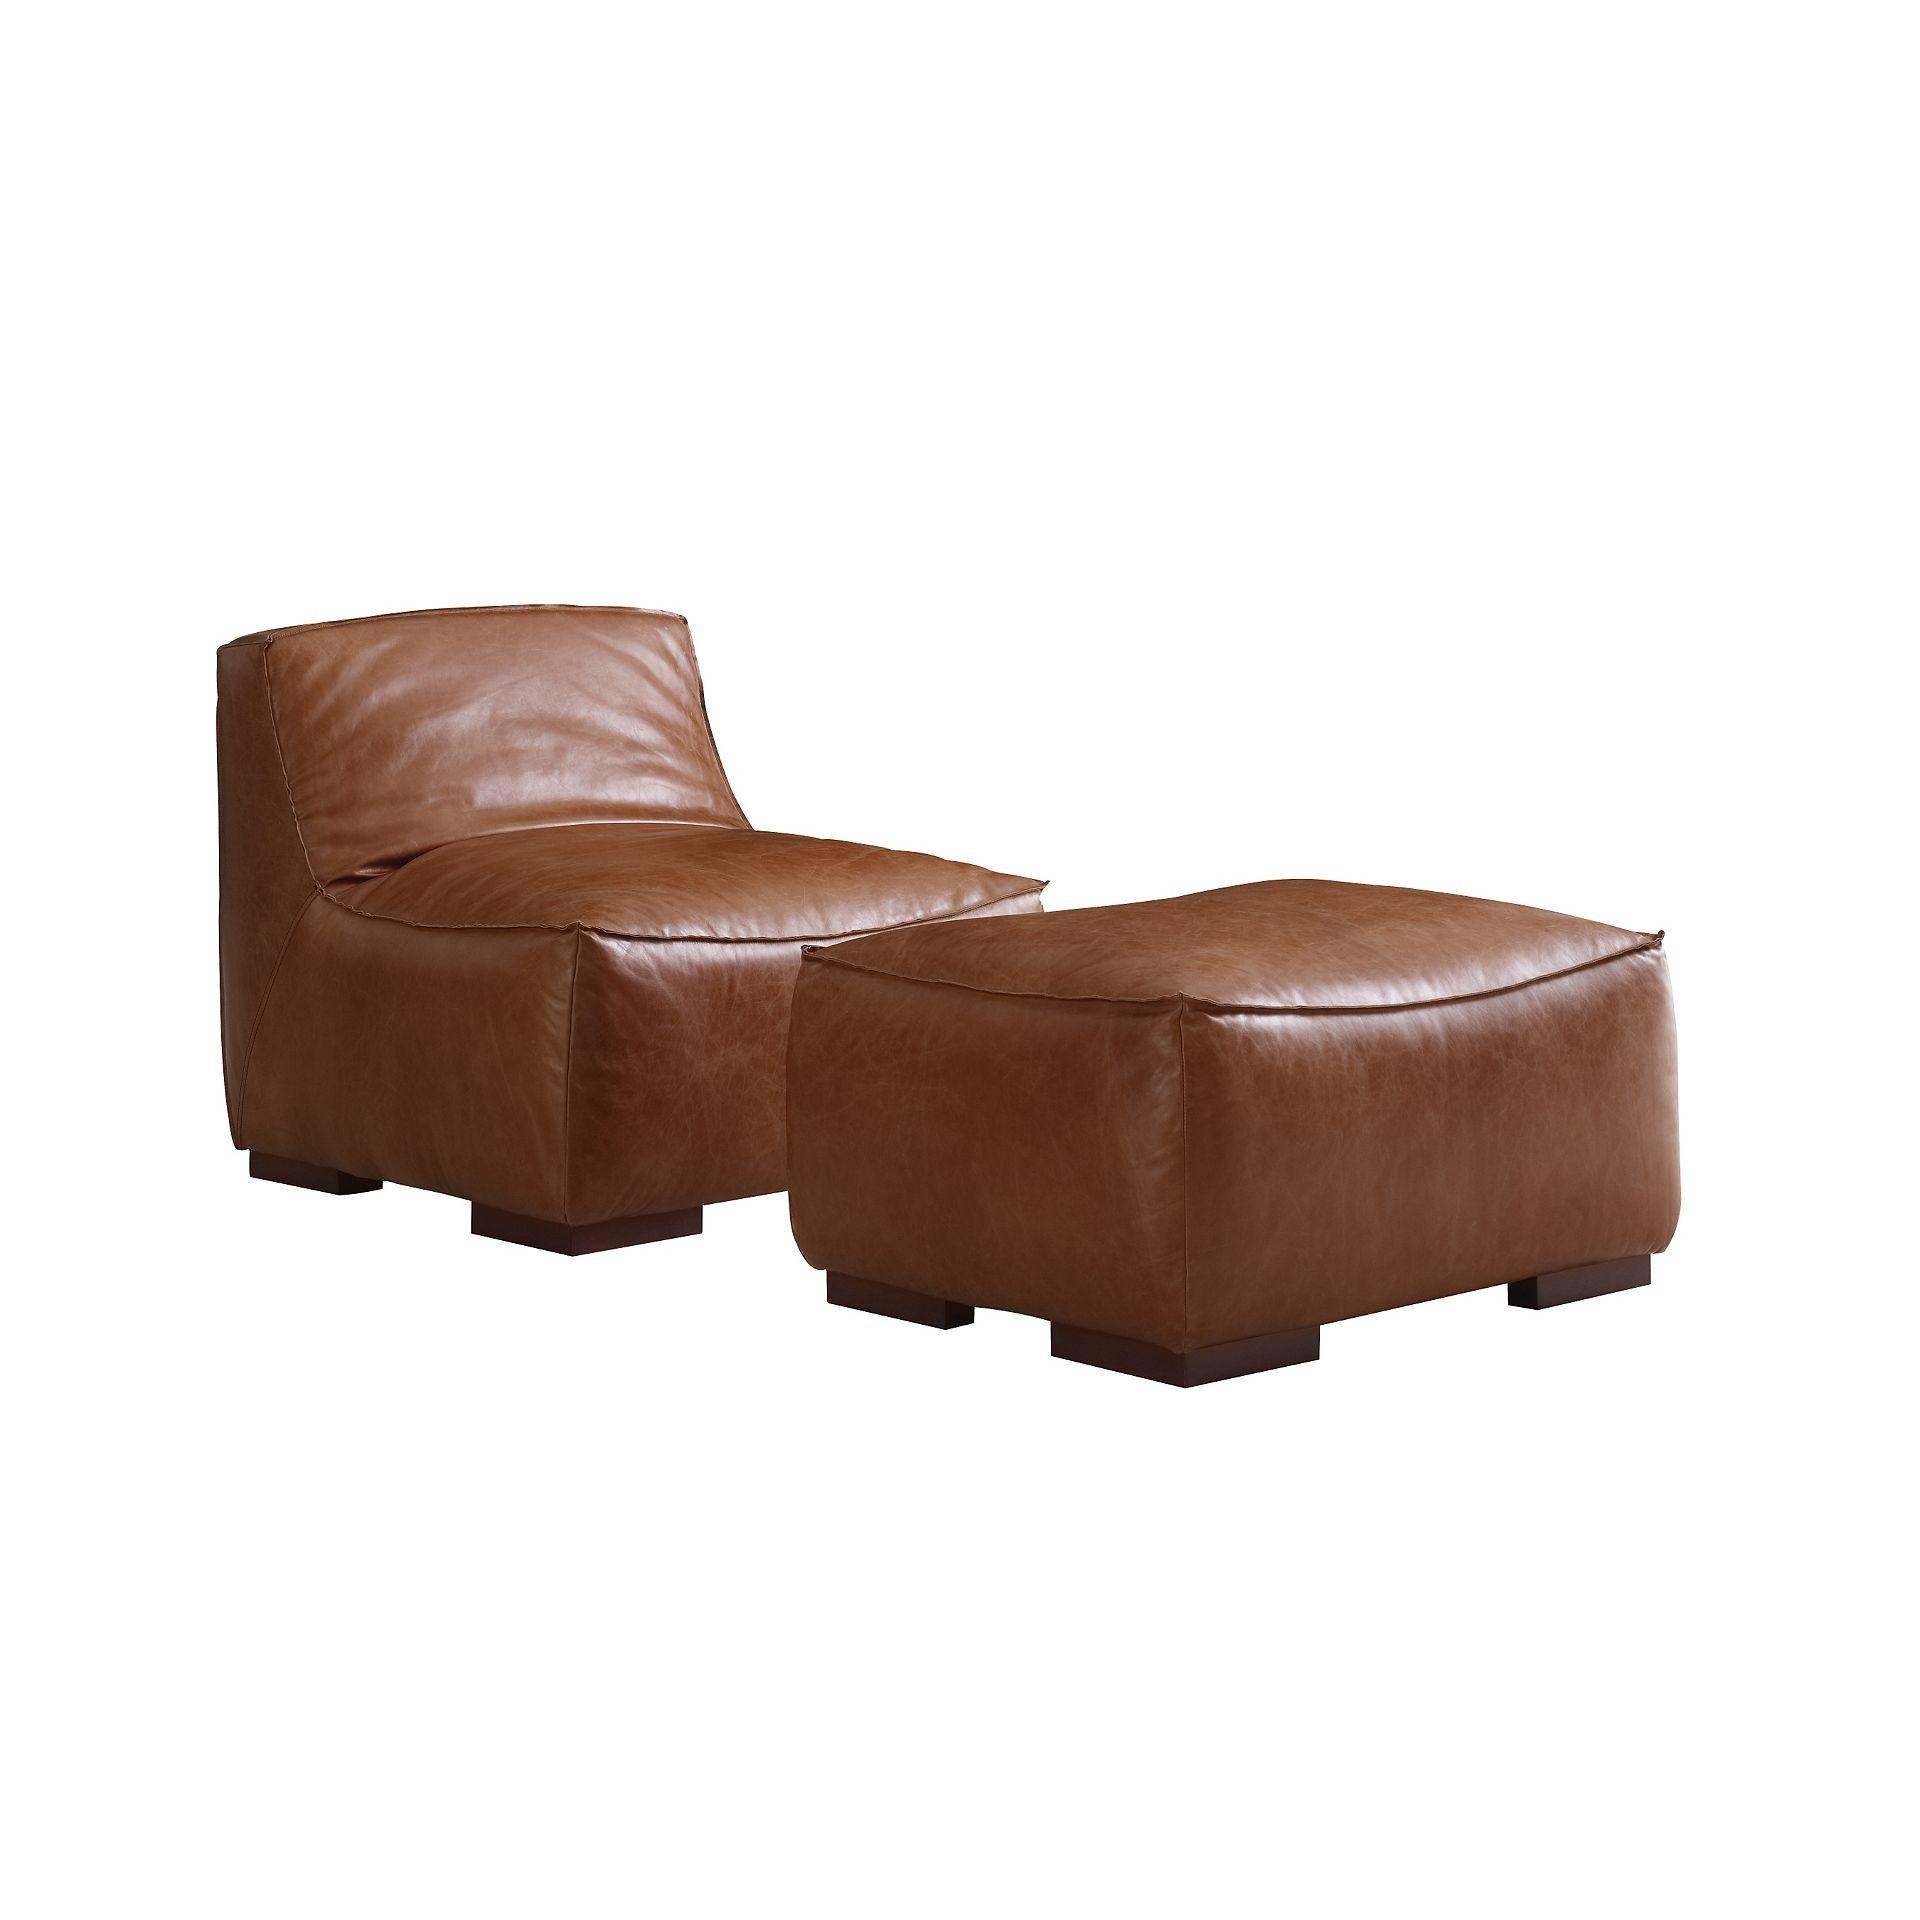 Henredon Furniture Henredon Leather Company Geneva Chair IL8867  sc 1 st  Goodu0027s Home Furnishings & Chairs by Henredon Furniture islam-shia.org